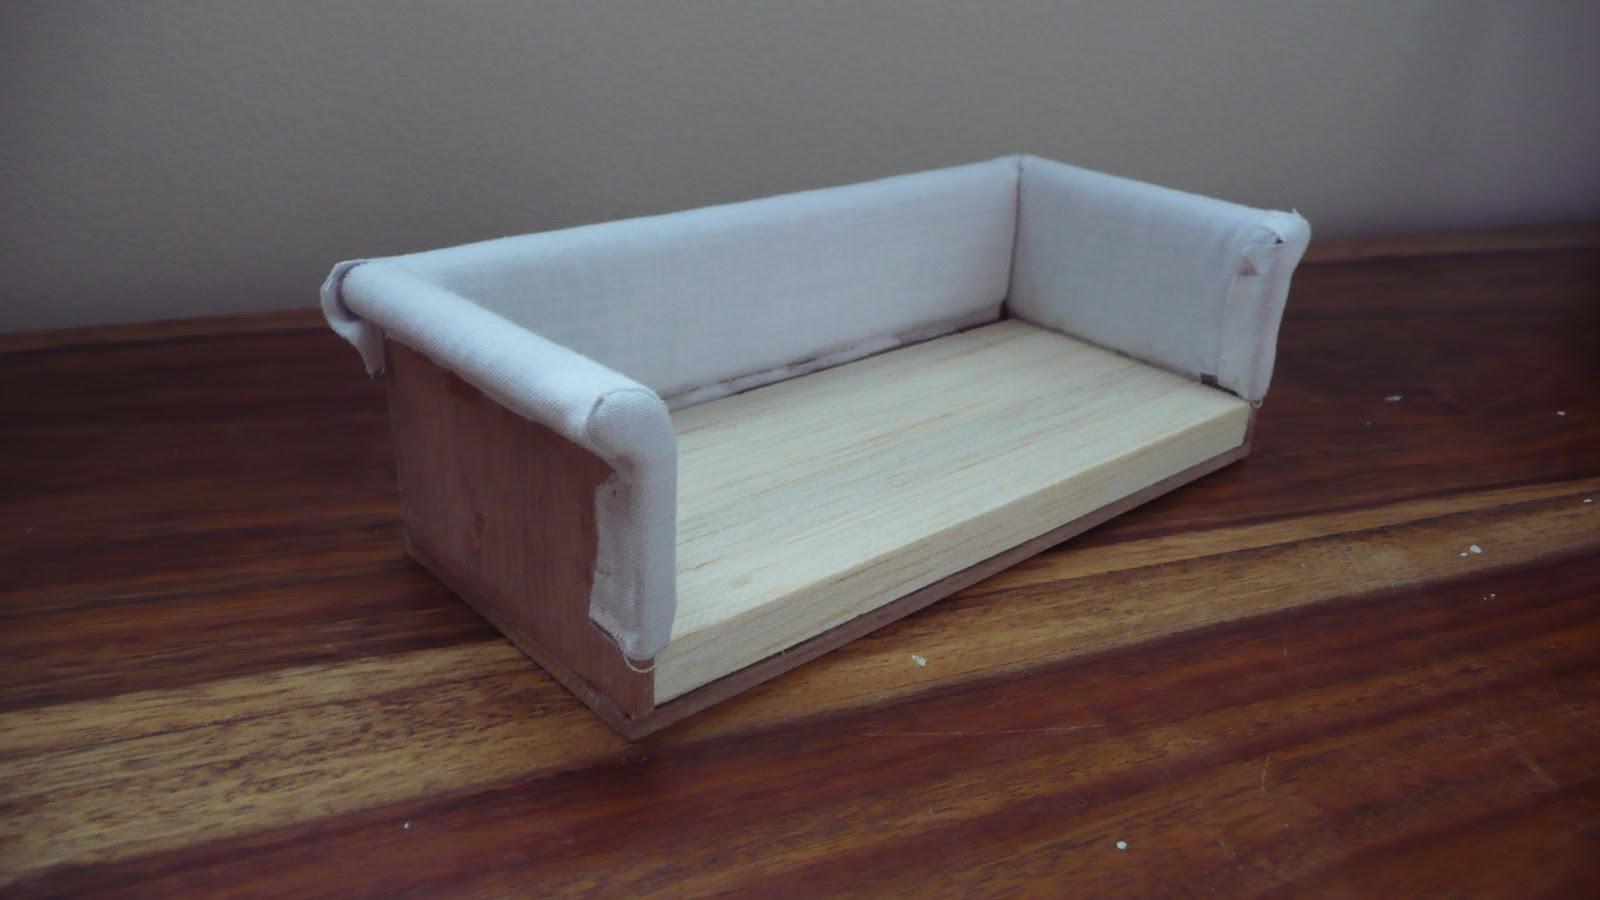 46 Deep Sofa Unique Amber 39s House 1 12 Just Needs Feet